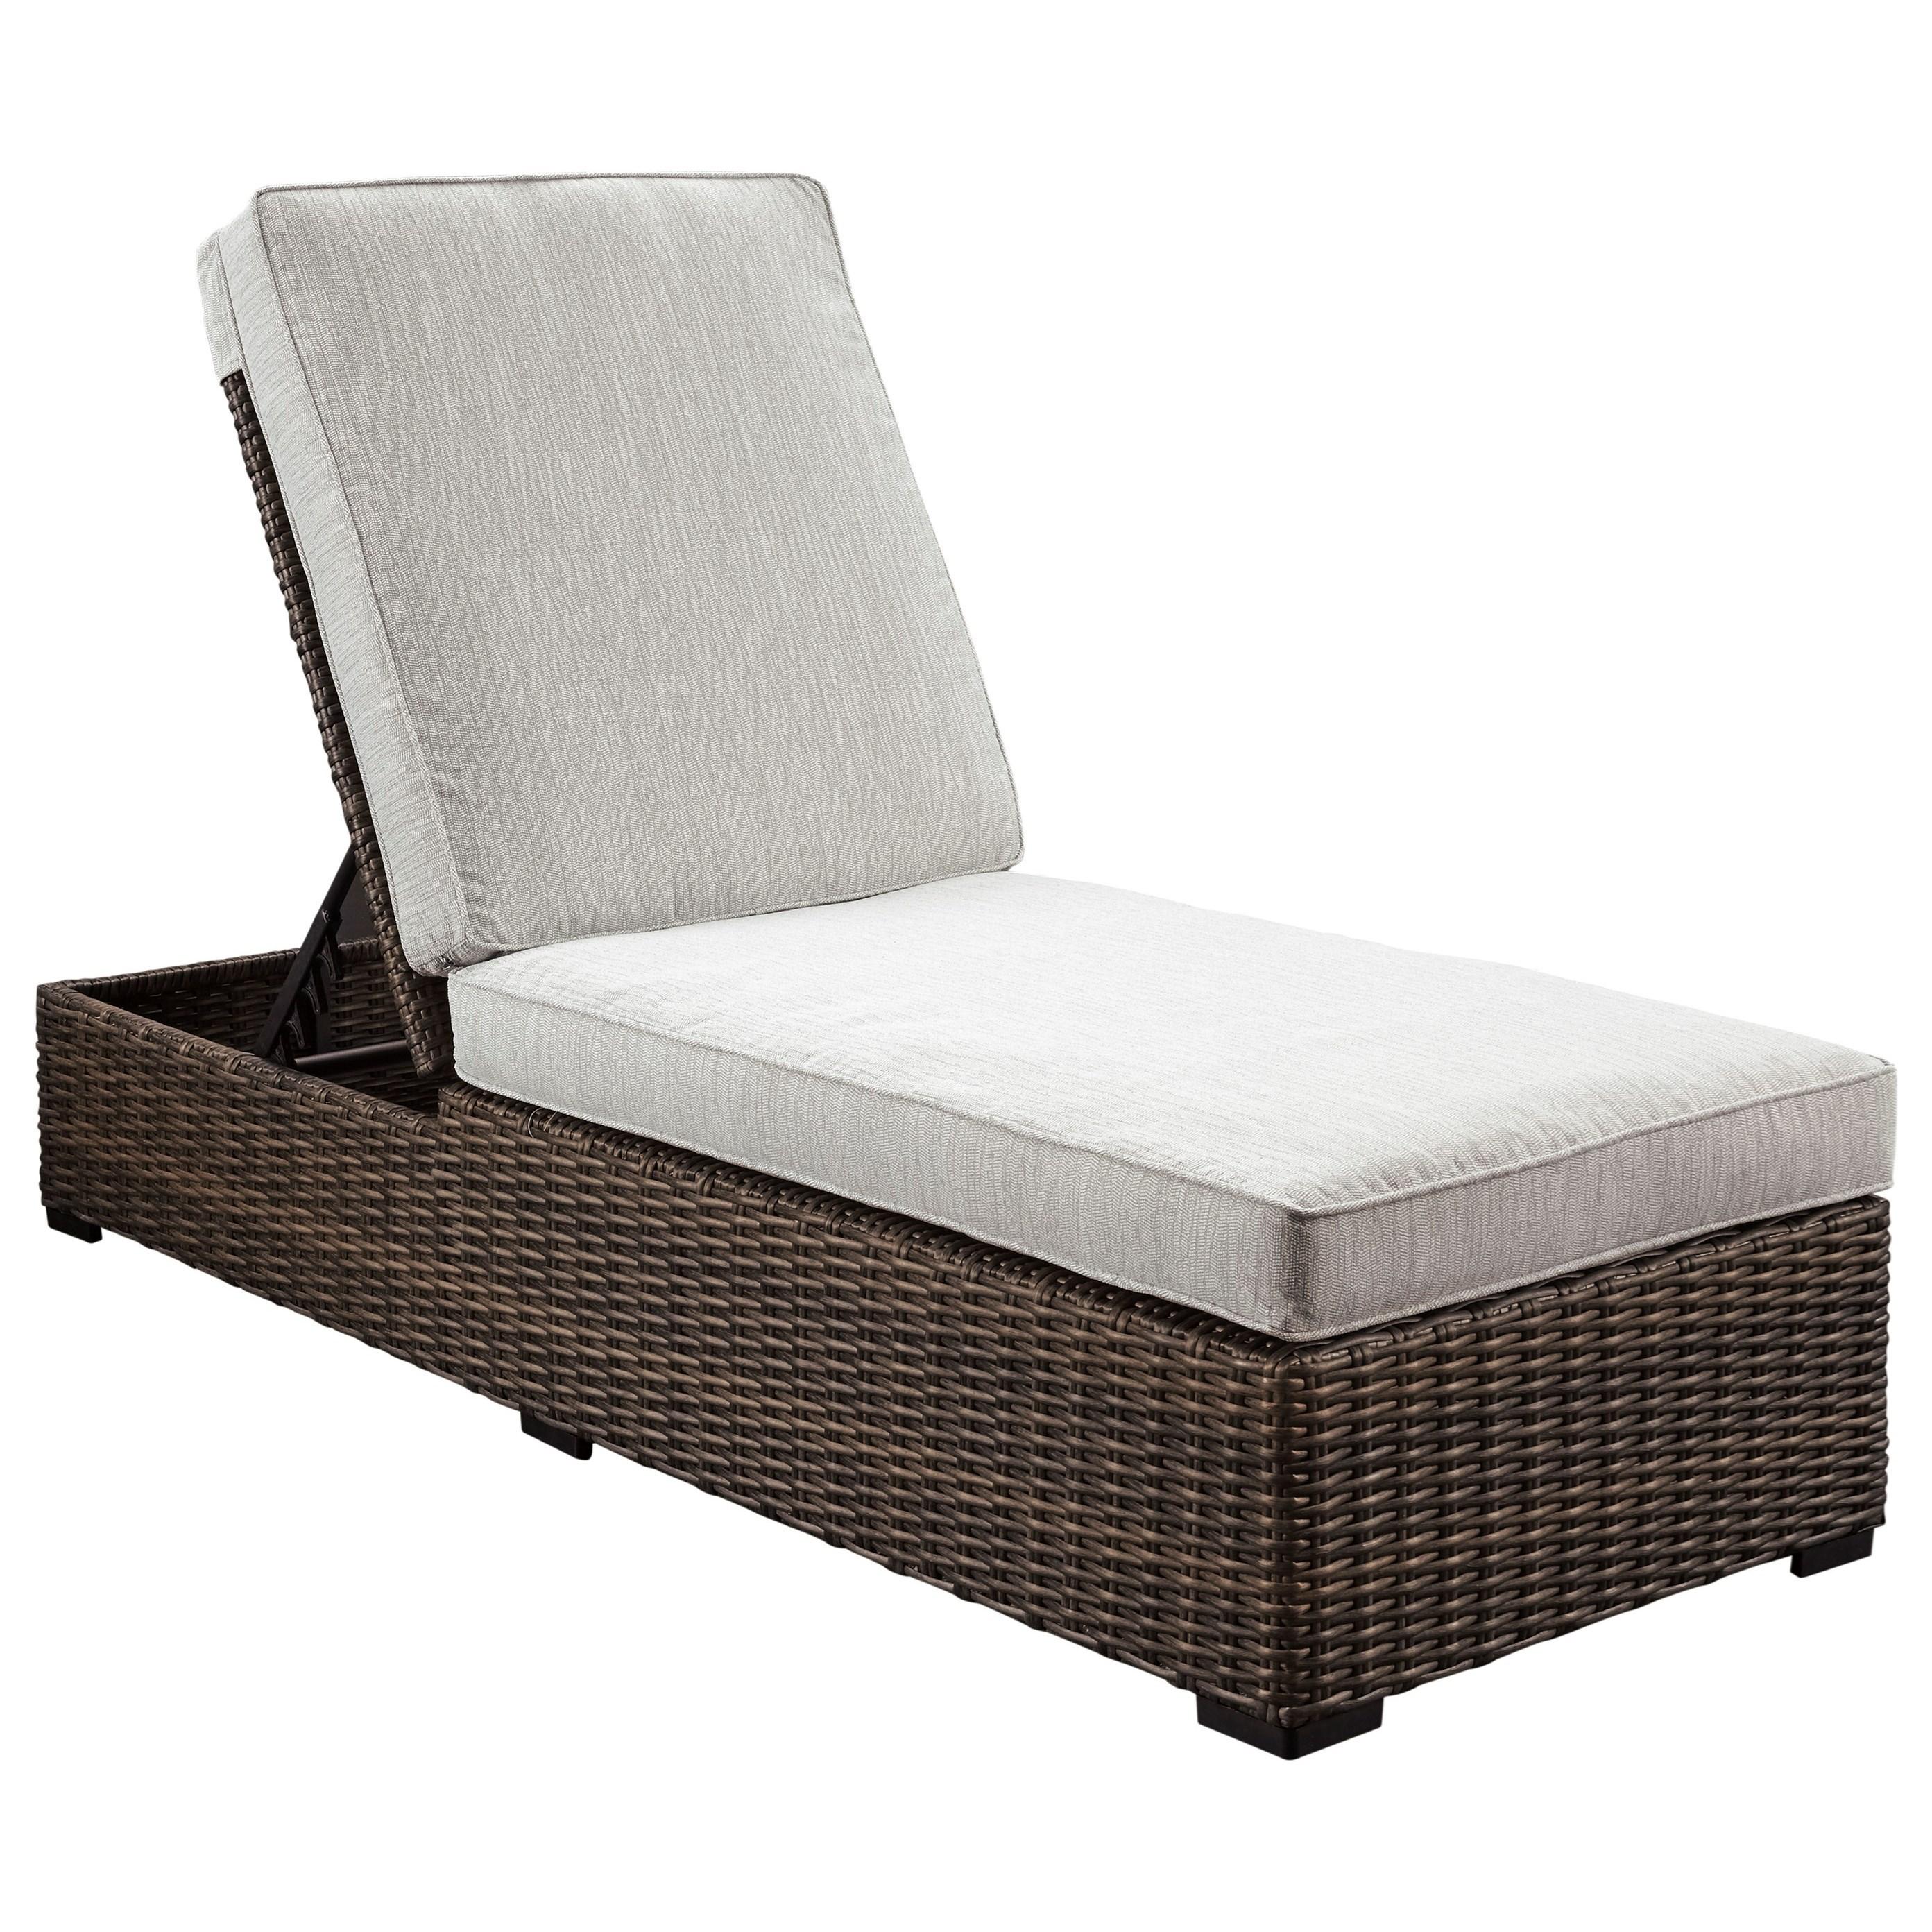 signature design by ashley alta grande adjustable chaise. Black Bedroom Furniture Sets. Home Design Ideas